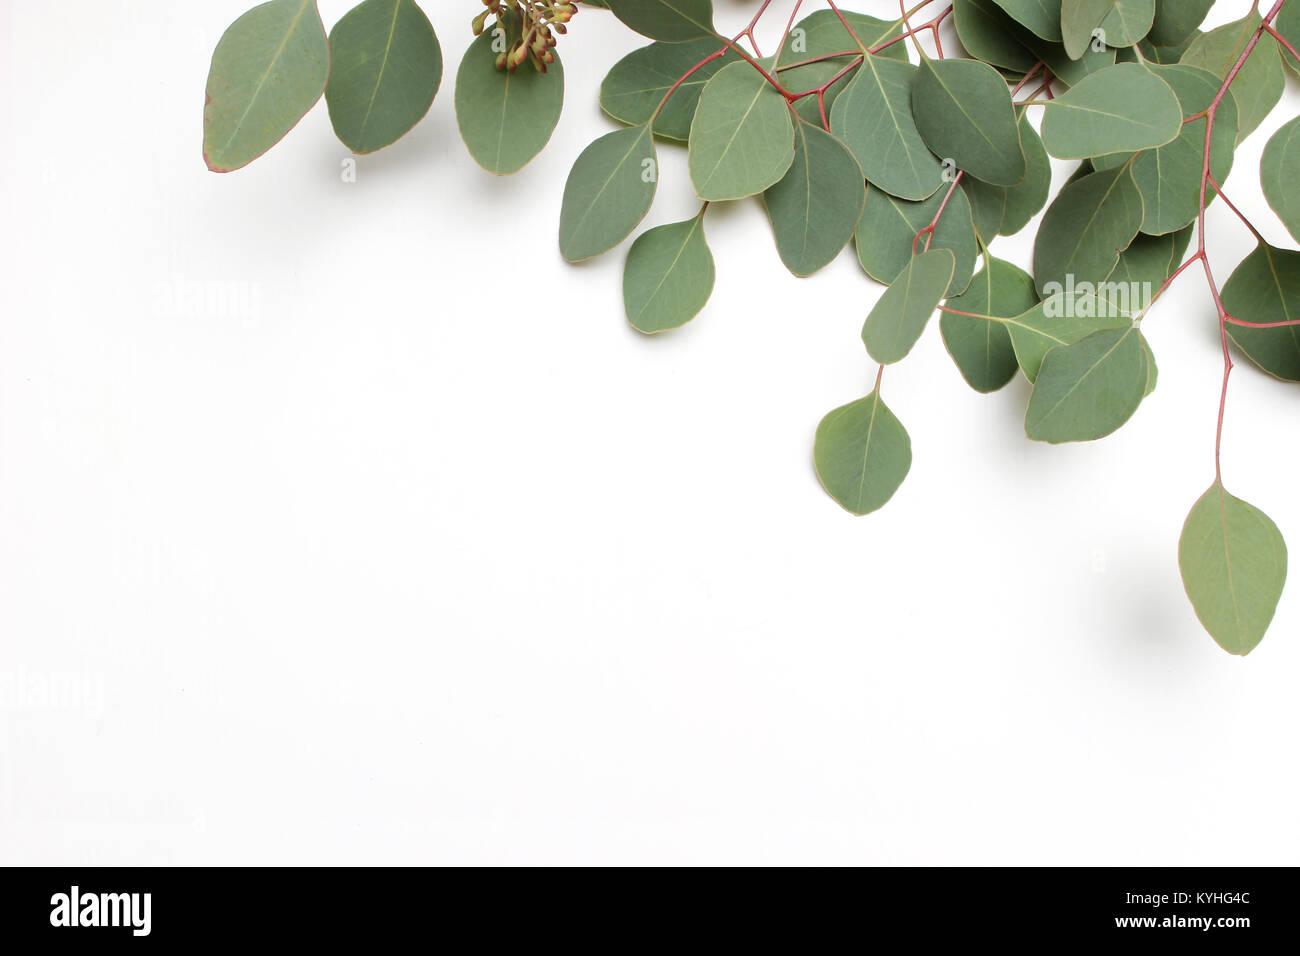 Rahmen, Rahmen aus grünem Silver Dollar Eukalyptus cinerea Blätter ...